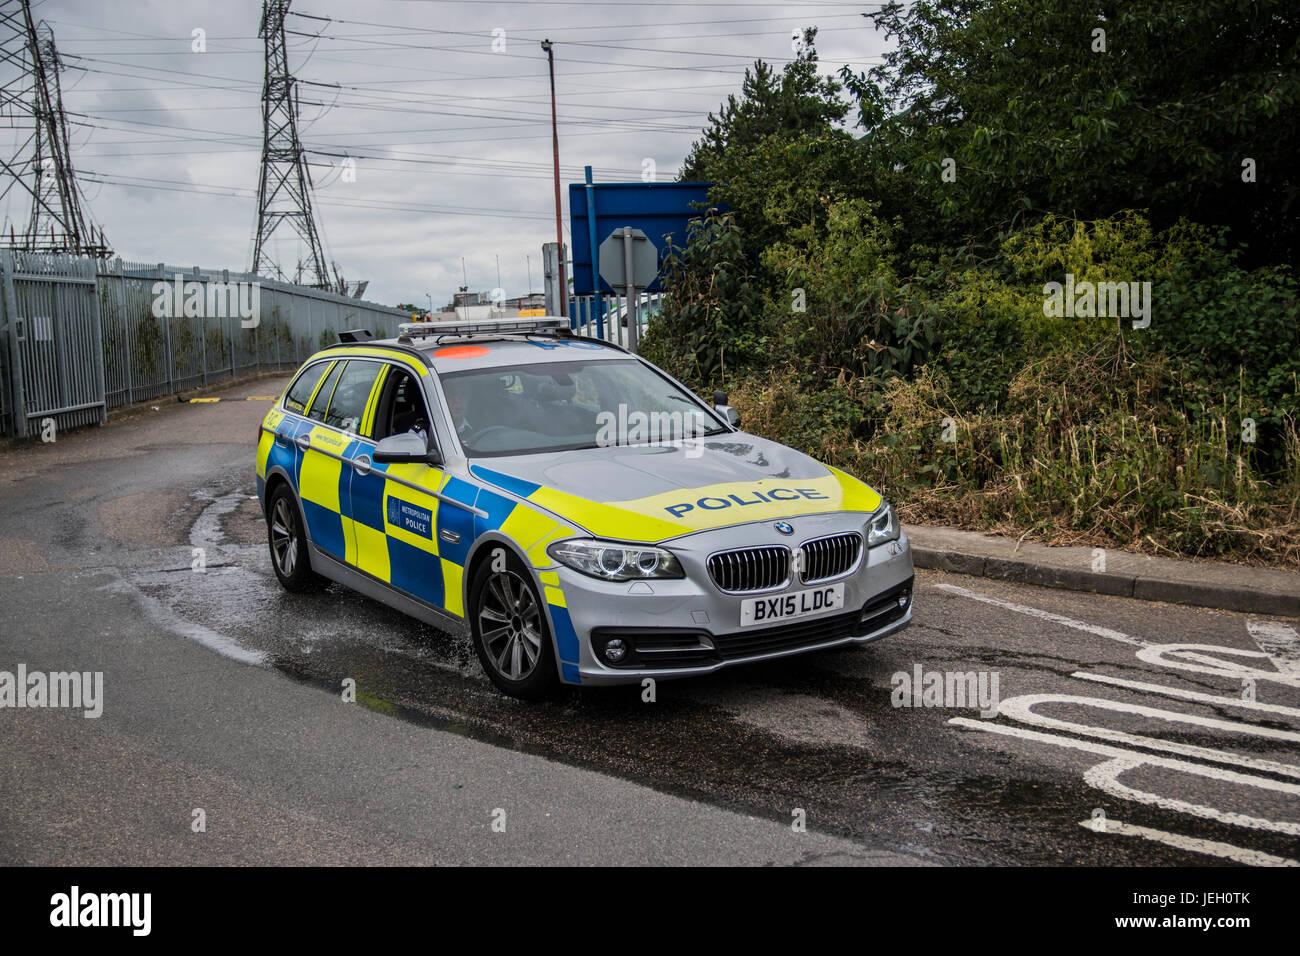 London Metropolitan Police BMW Area Car leaving the scene of a car lot fire in Croydon, Surrey Stock Photo